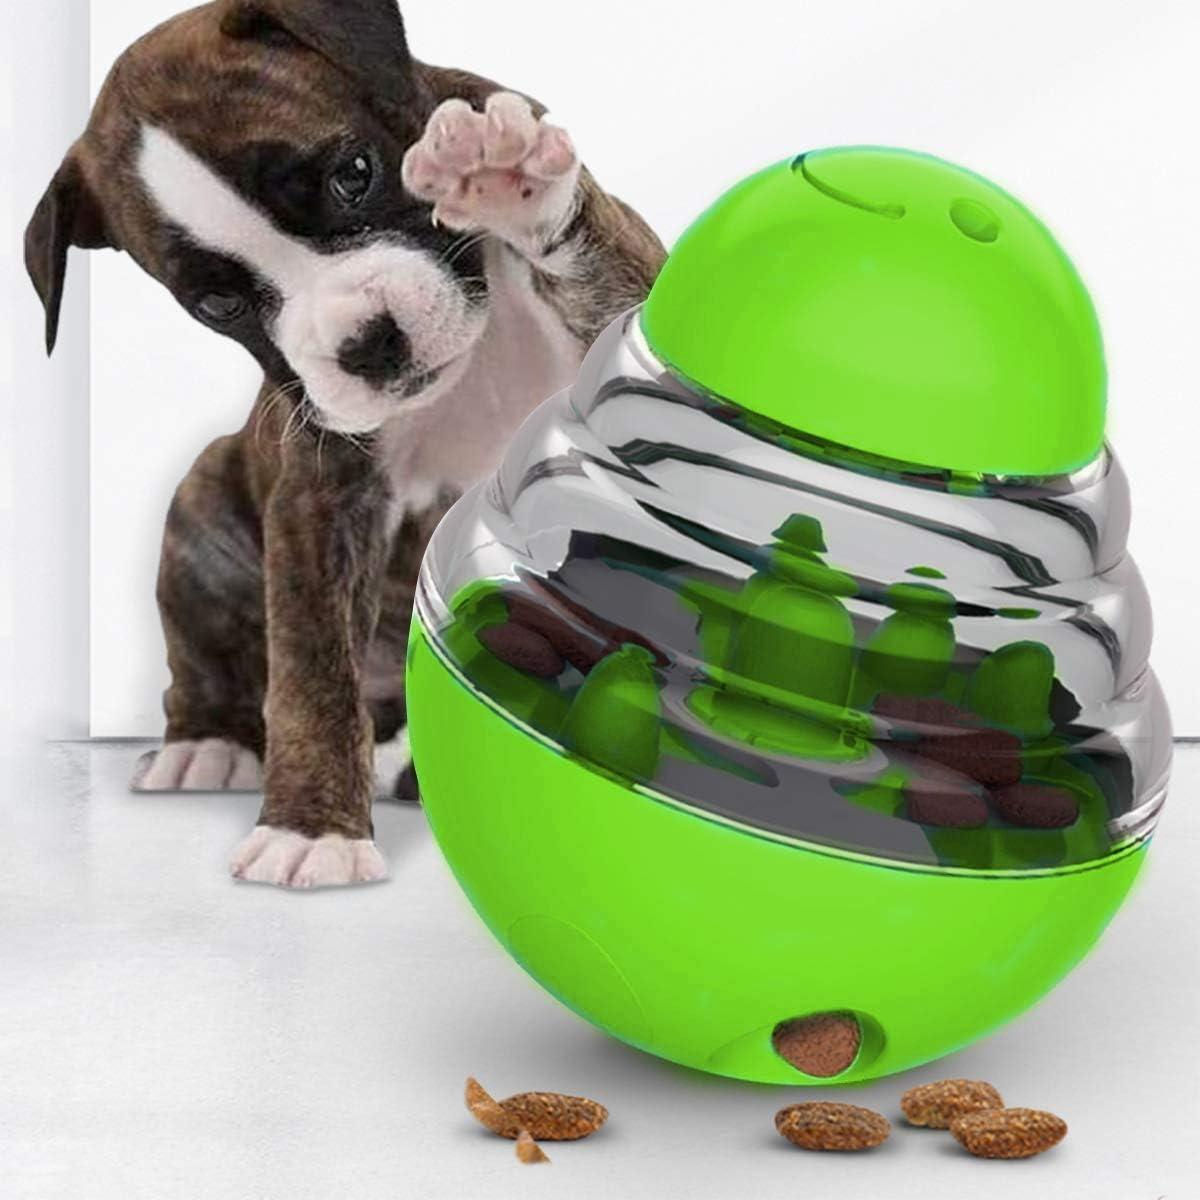 Akoasm Max 56% OFF Ranking TOP2 Dog Toys Pet IQ Ball Adjustable – Ba Treat